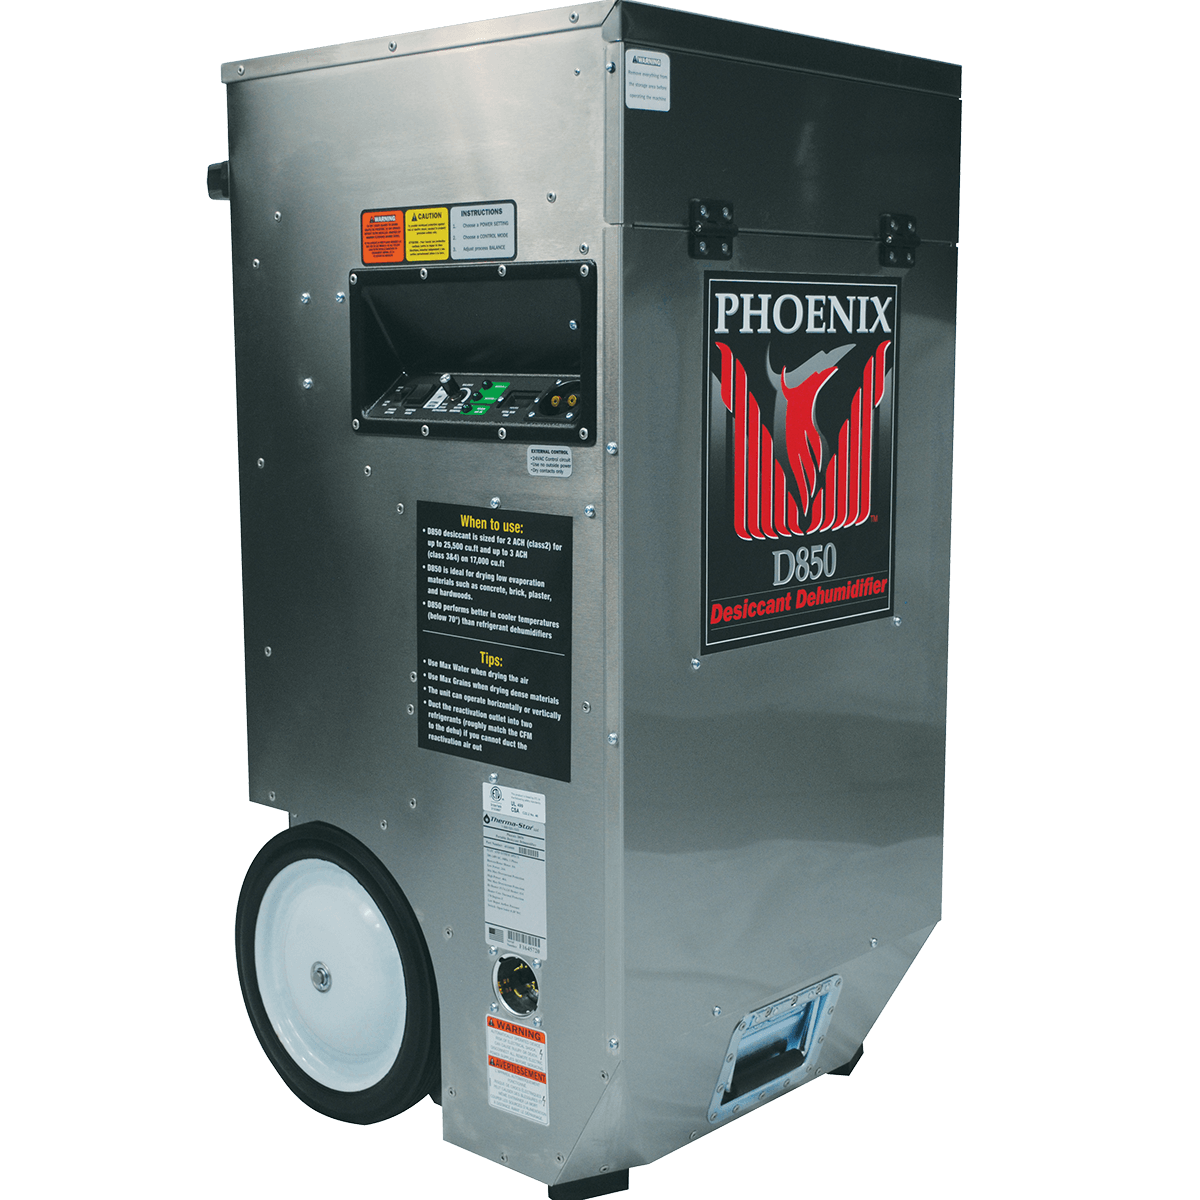 Buy Cheap Phoenix D850 Desiccant Dehumidifier